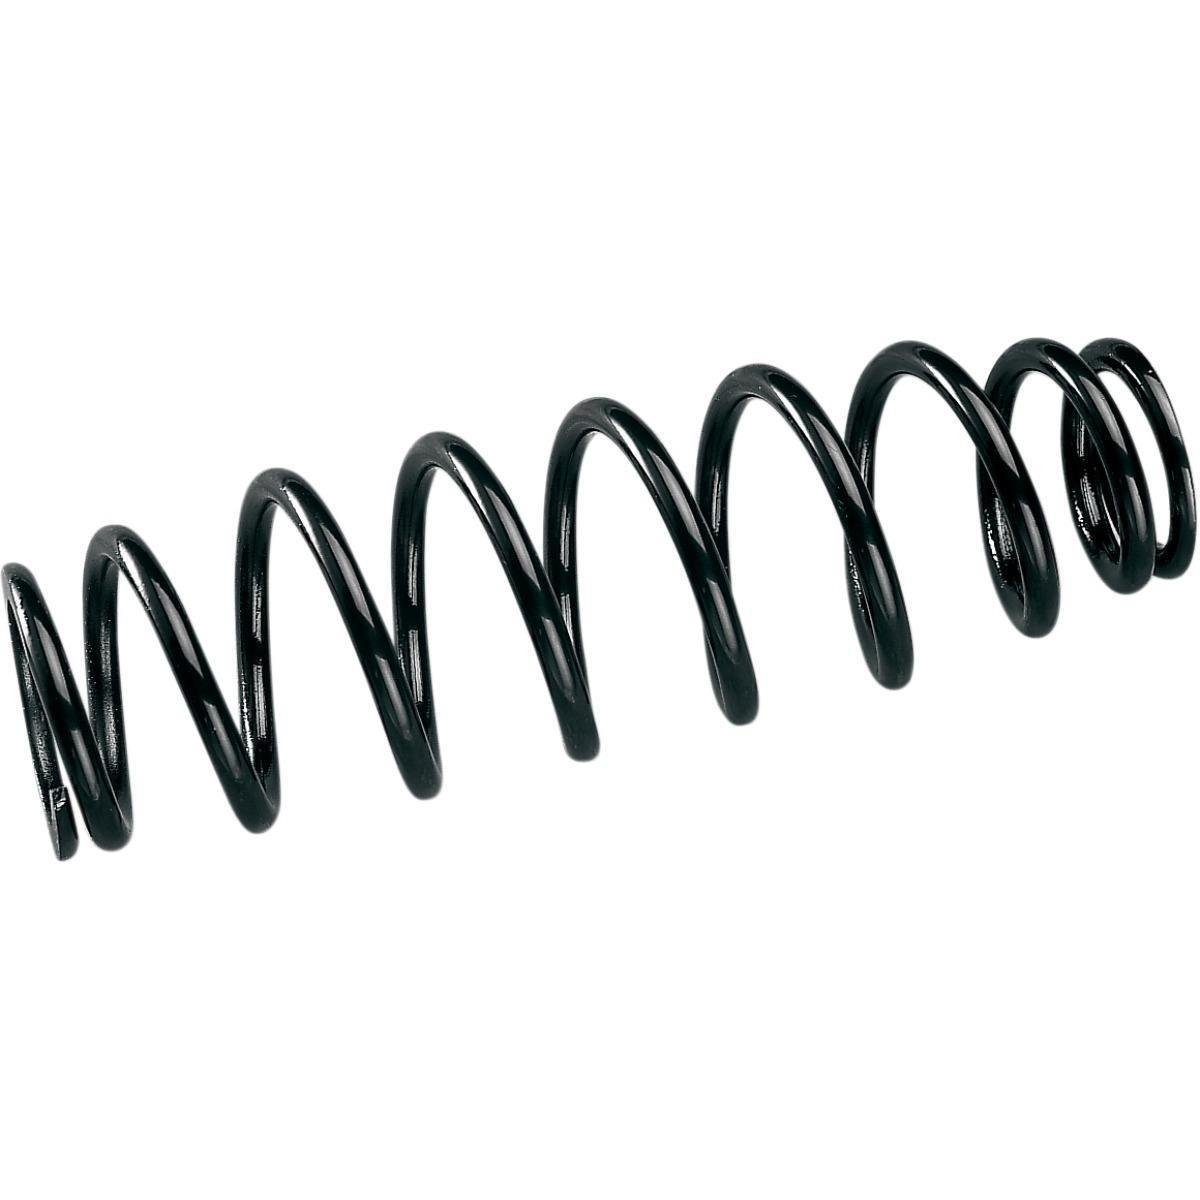 EPI WE325117 Heavy Duty Suspension Spring - Black by EPI (Image #1)